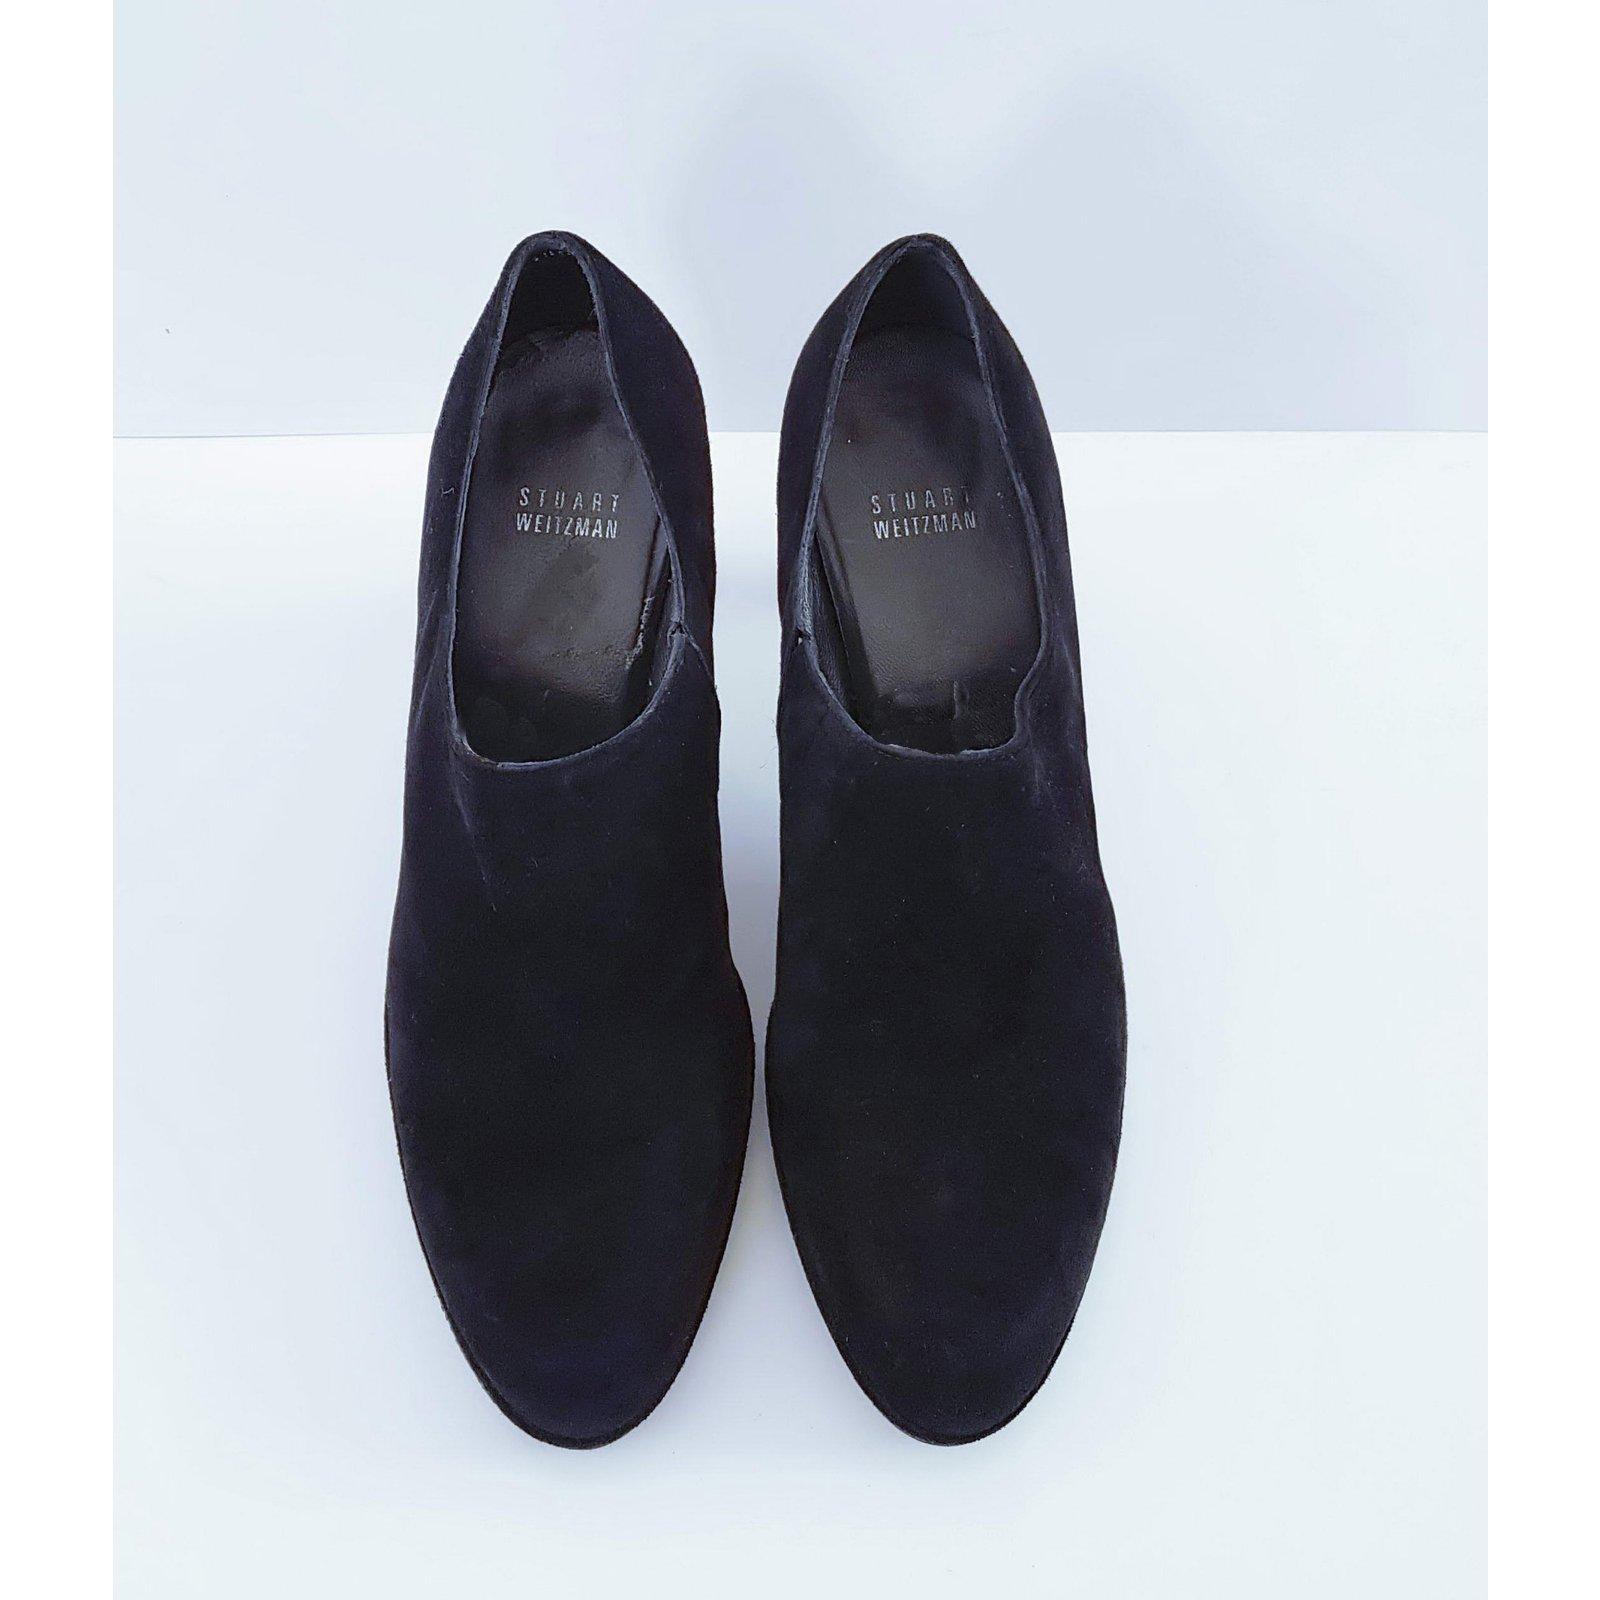 26abcd56a8a5 Stuart Weitzman Ankle Boots Ankle Boots Suede Black ref.62042 - Joli Closet